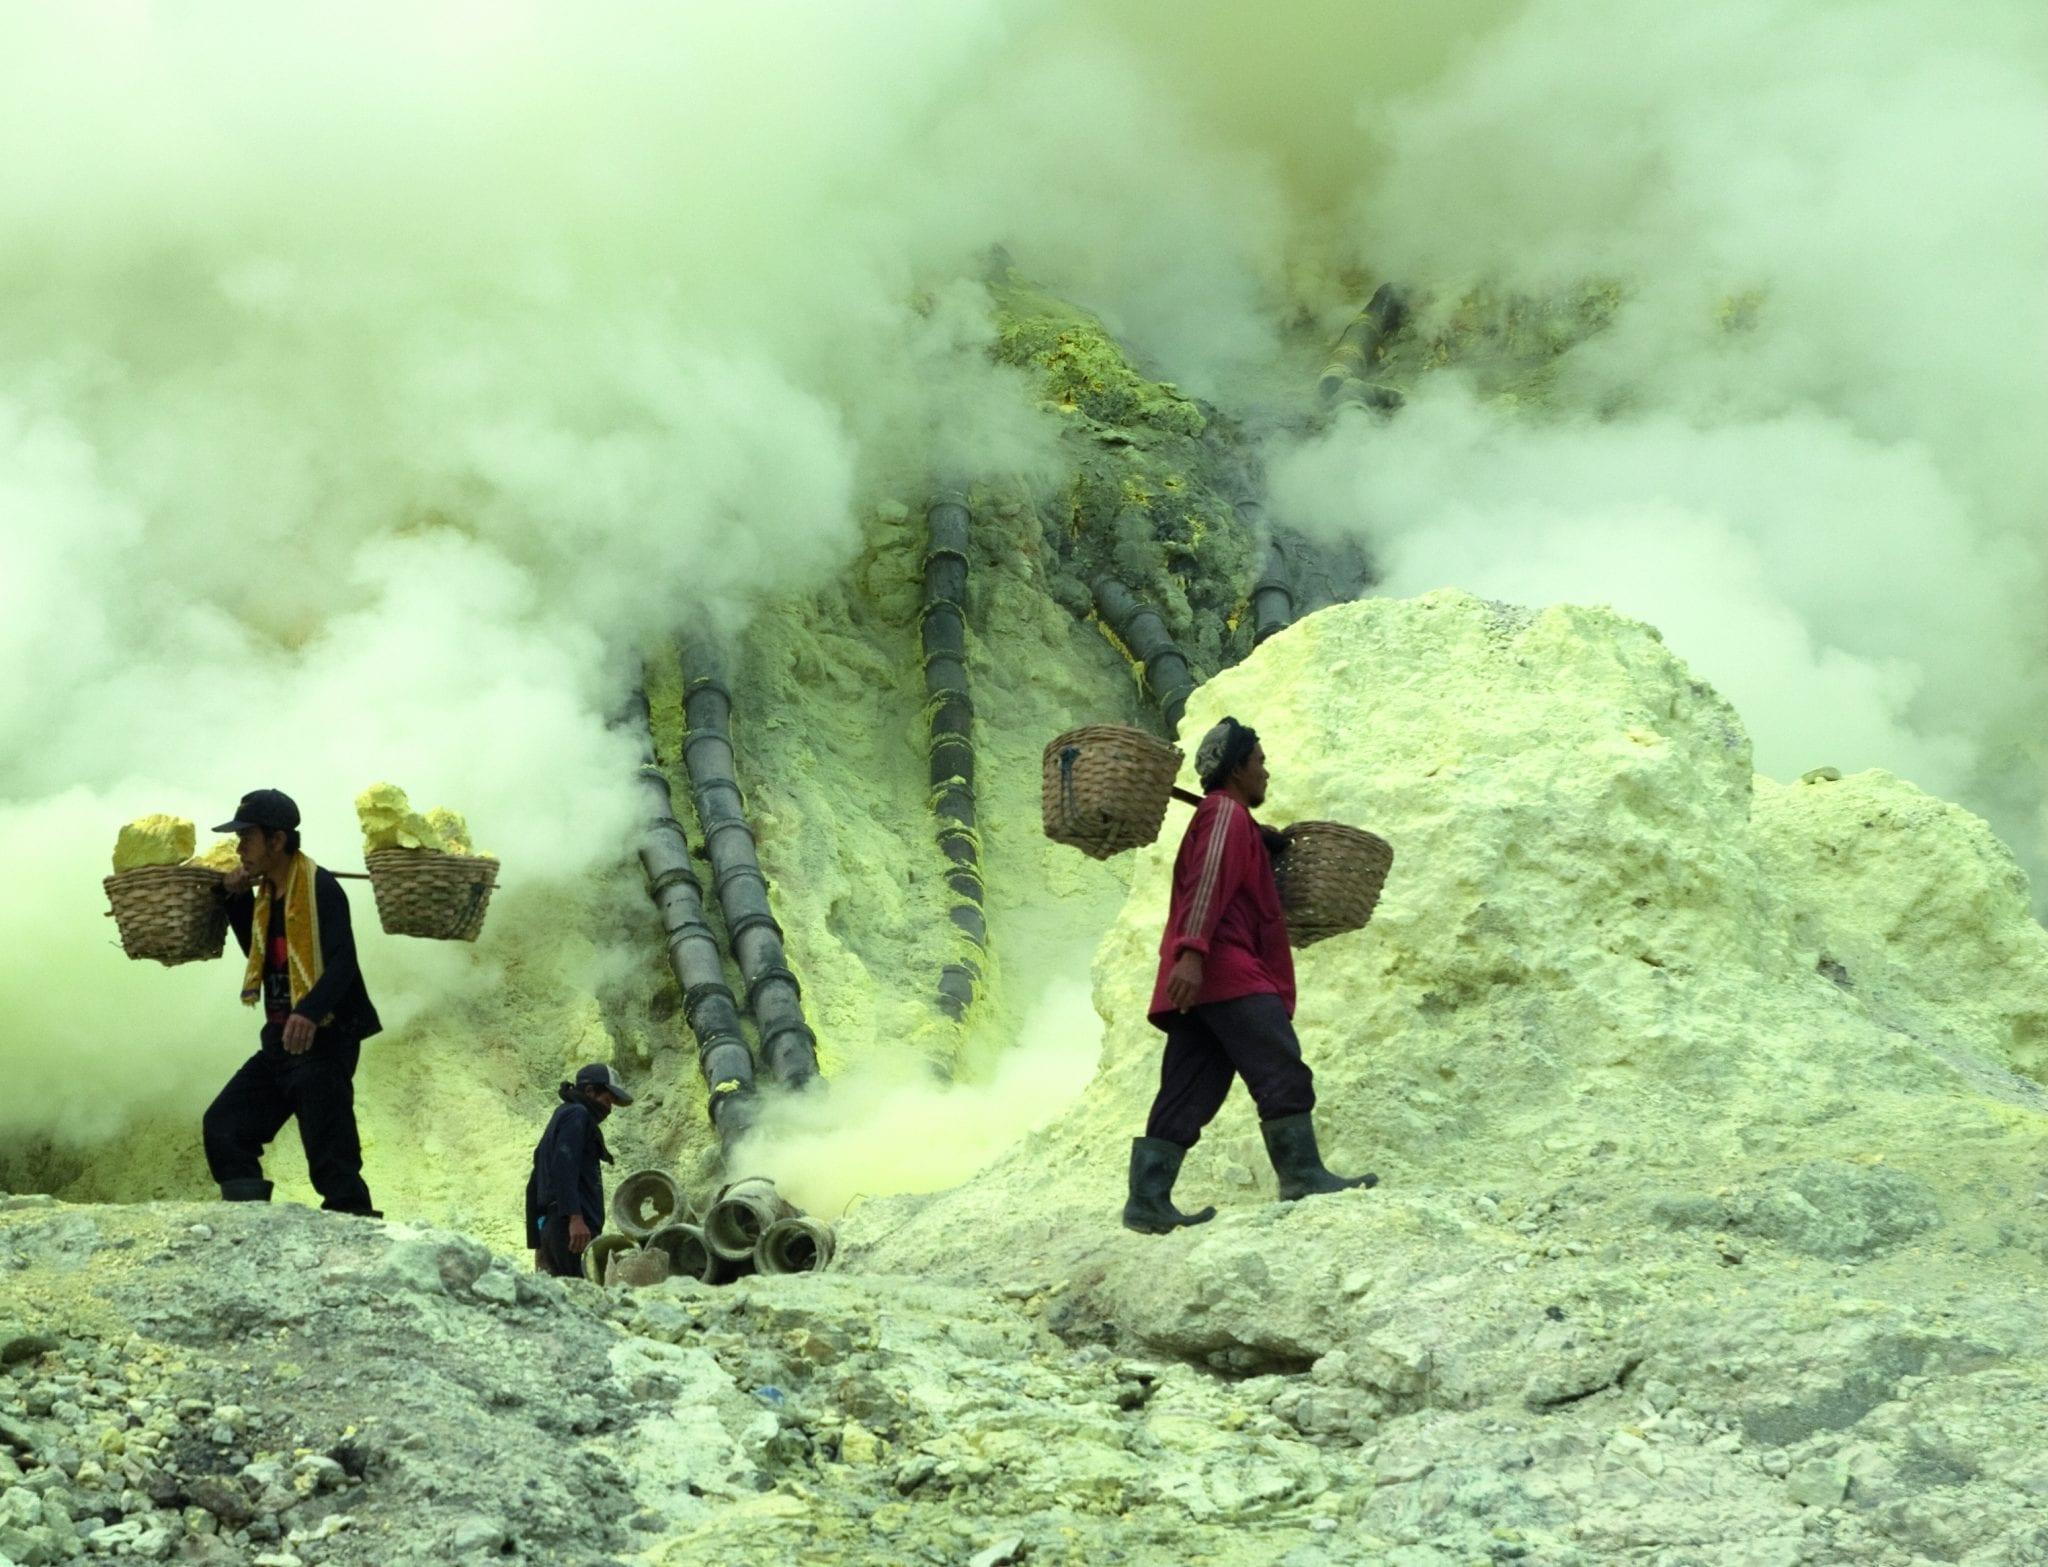 Toxic fumes | Views | REVOLVE